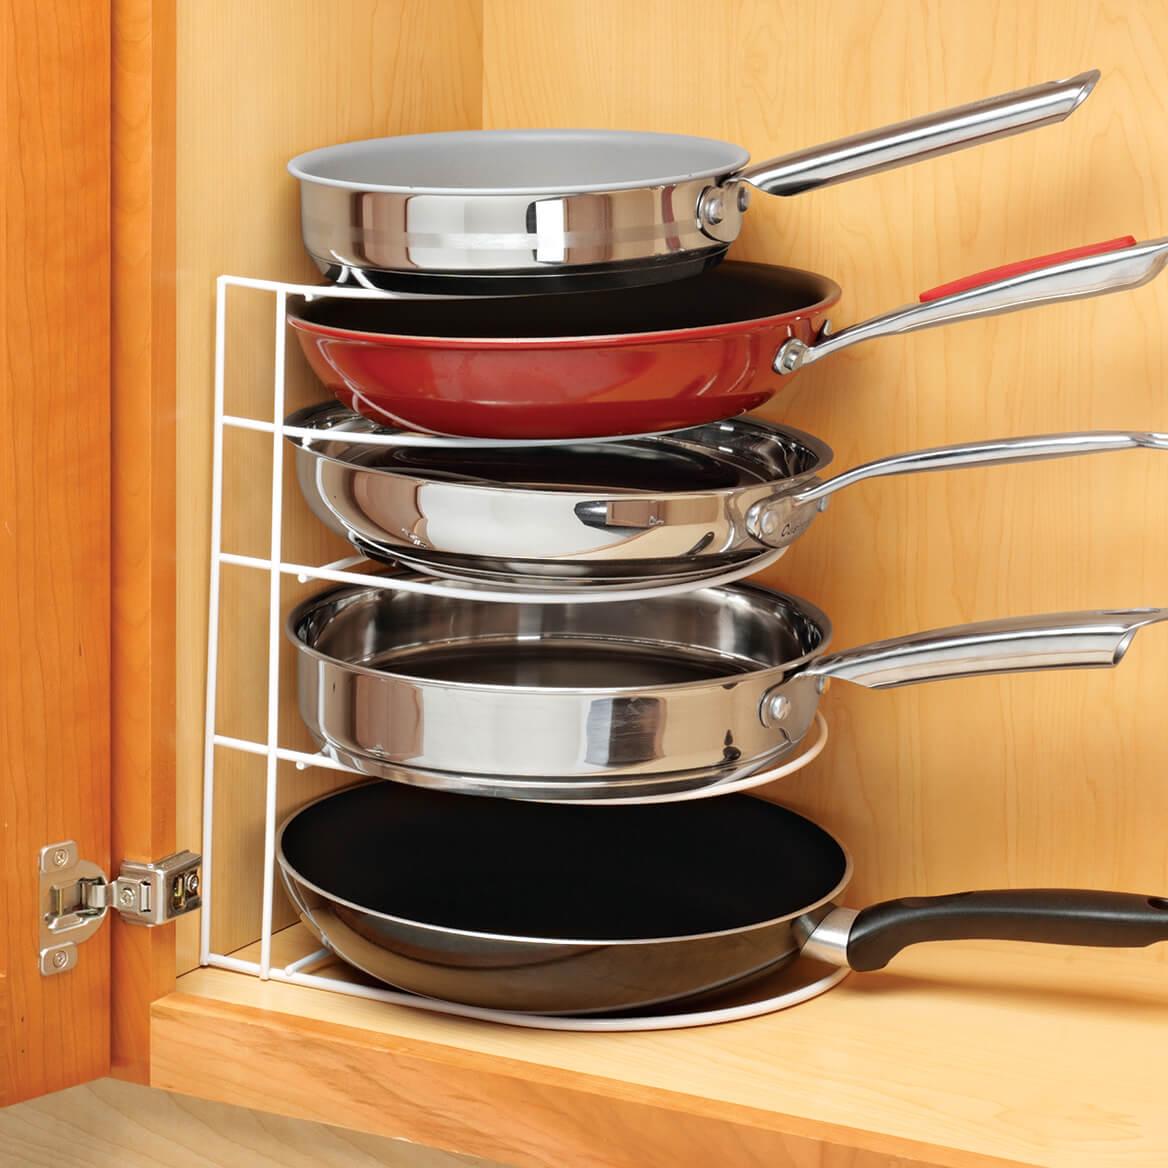 Frying Pan Organizer - Cabinet Pan Organizer - Miles Kimball